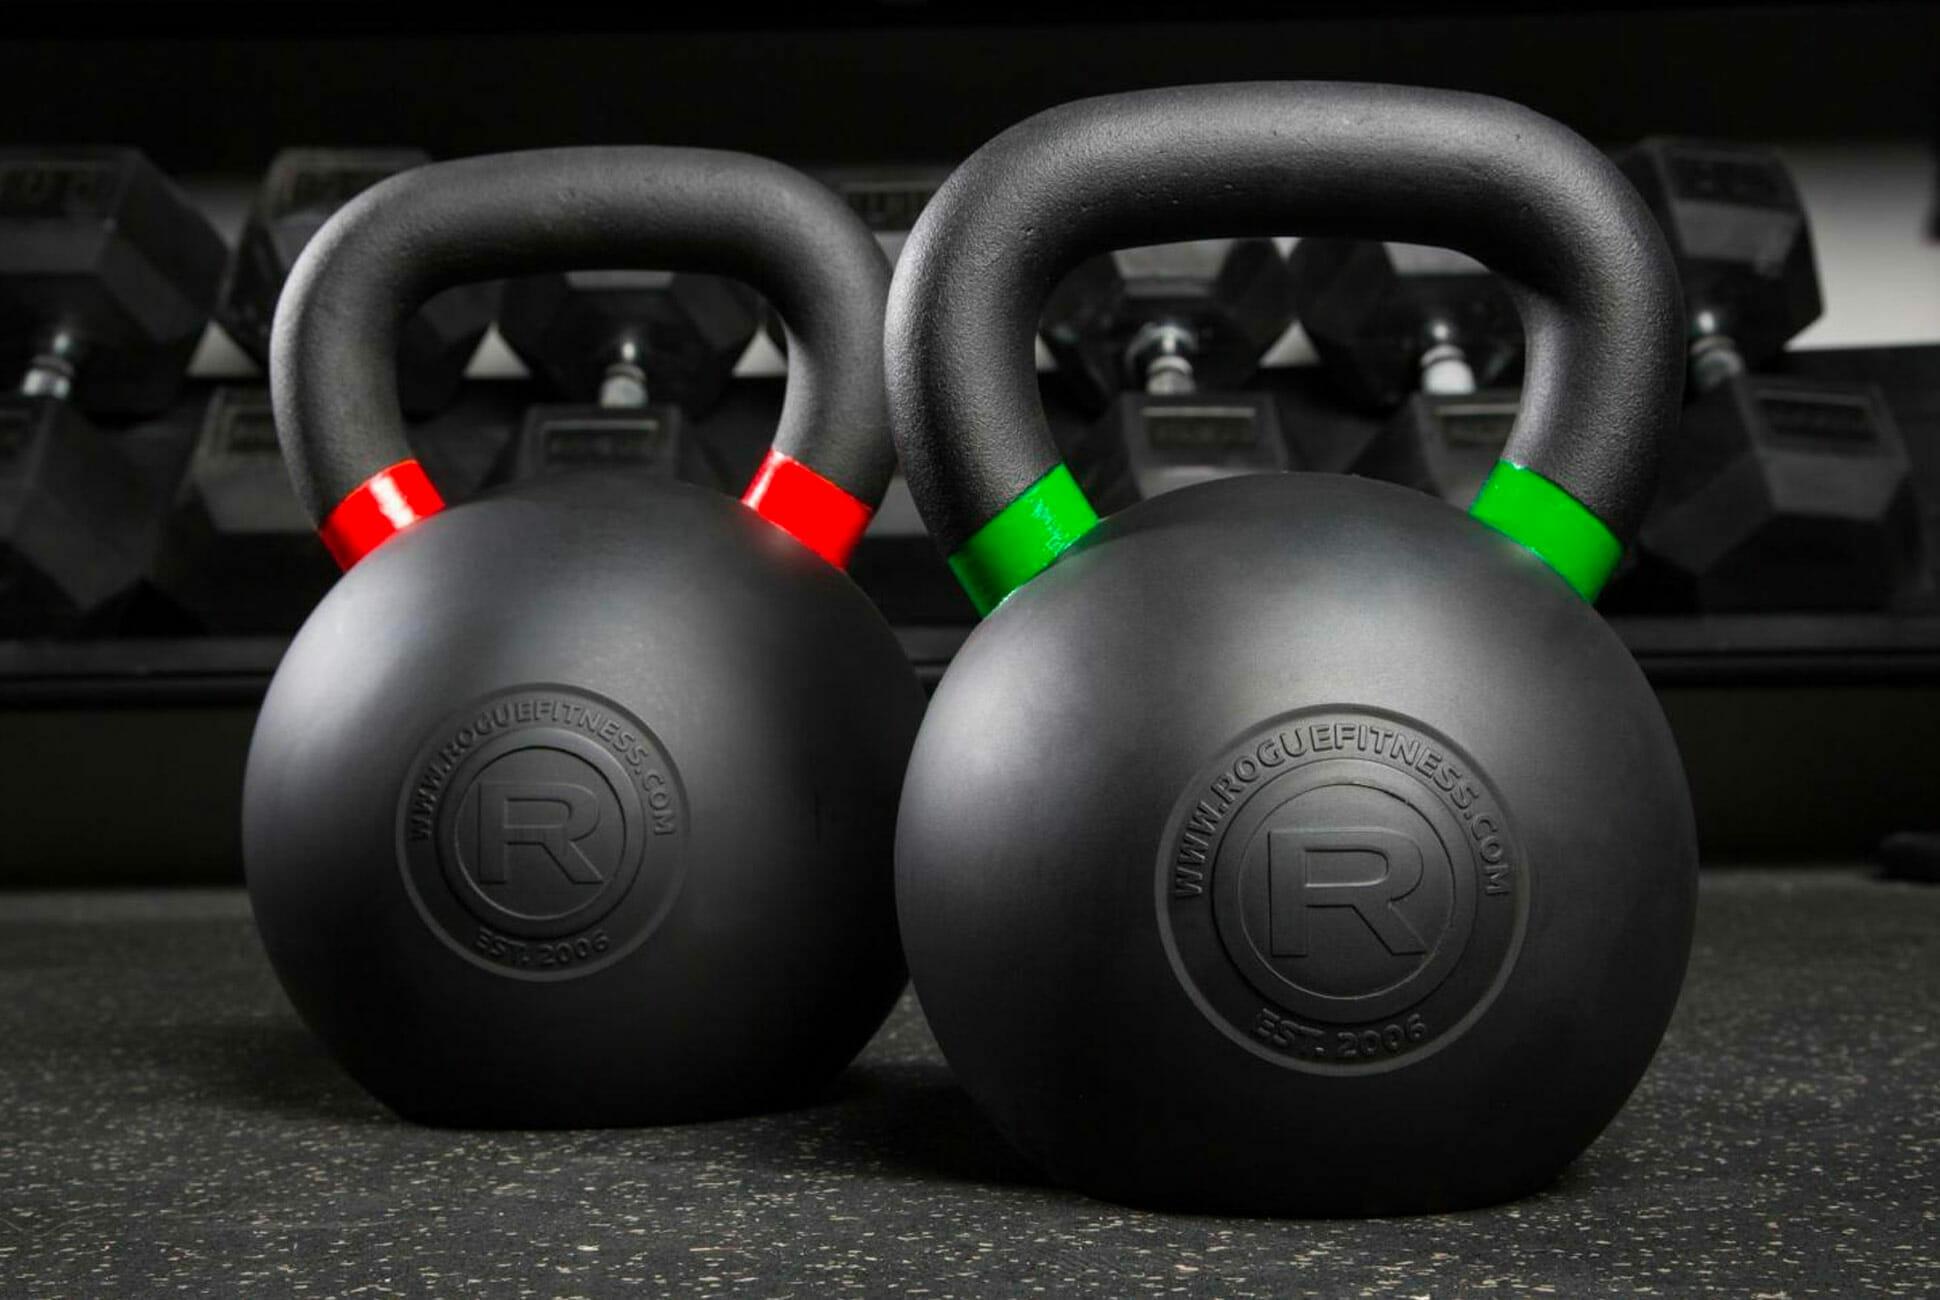 Best Kettlebells For Home Workout